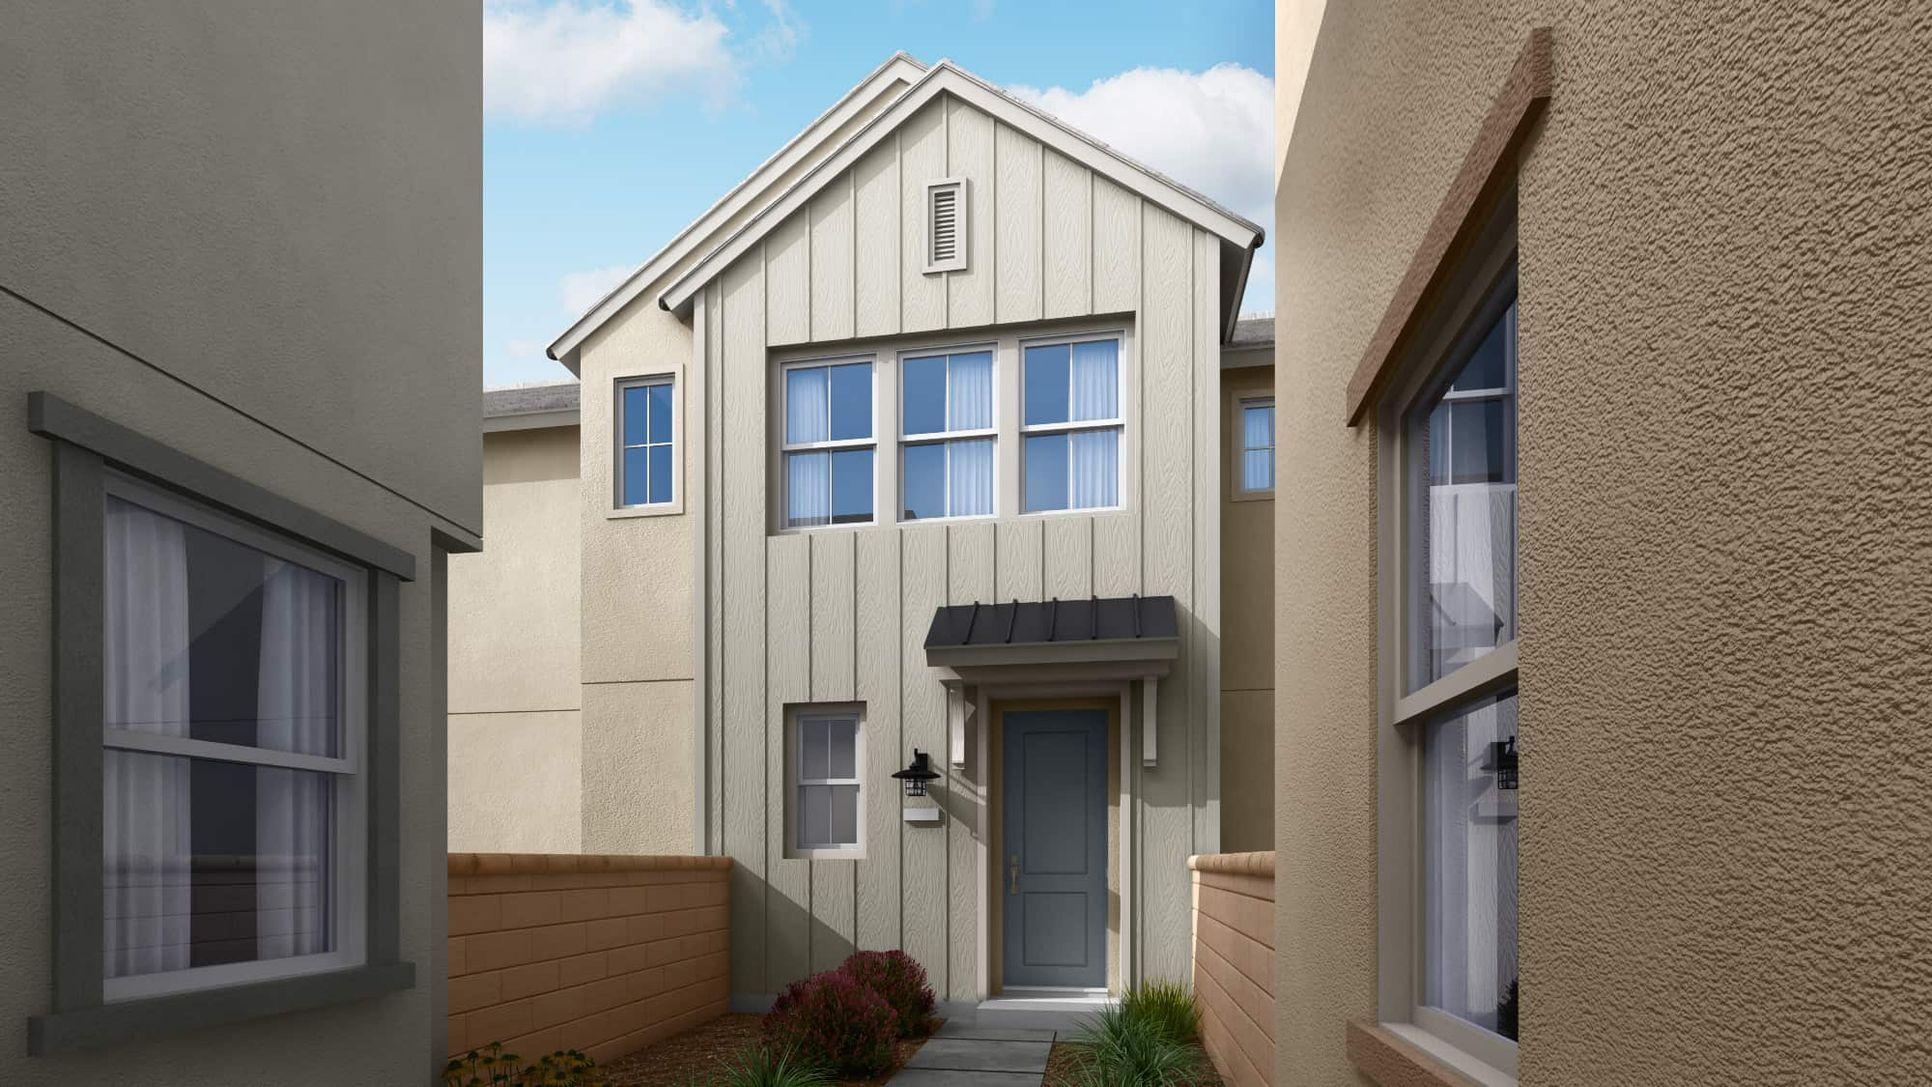 Delia Plan 1B:American Farmhouse Exterior Style | Preliminary Rendering